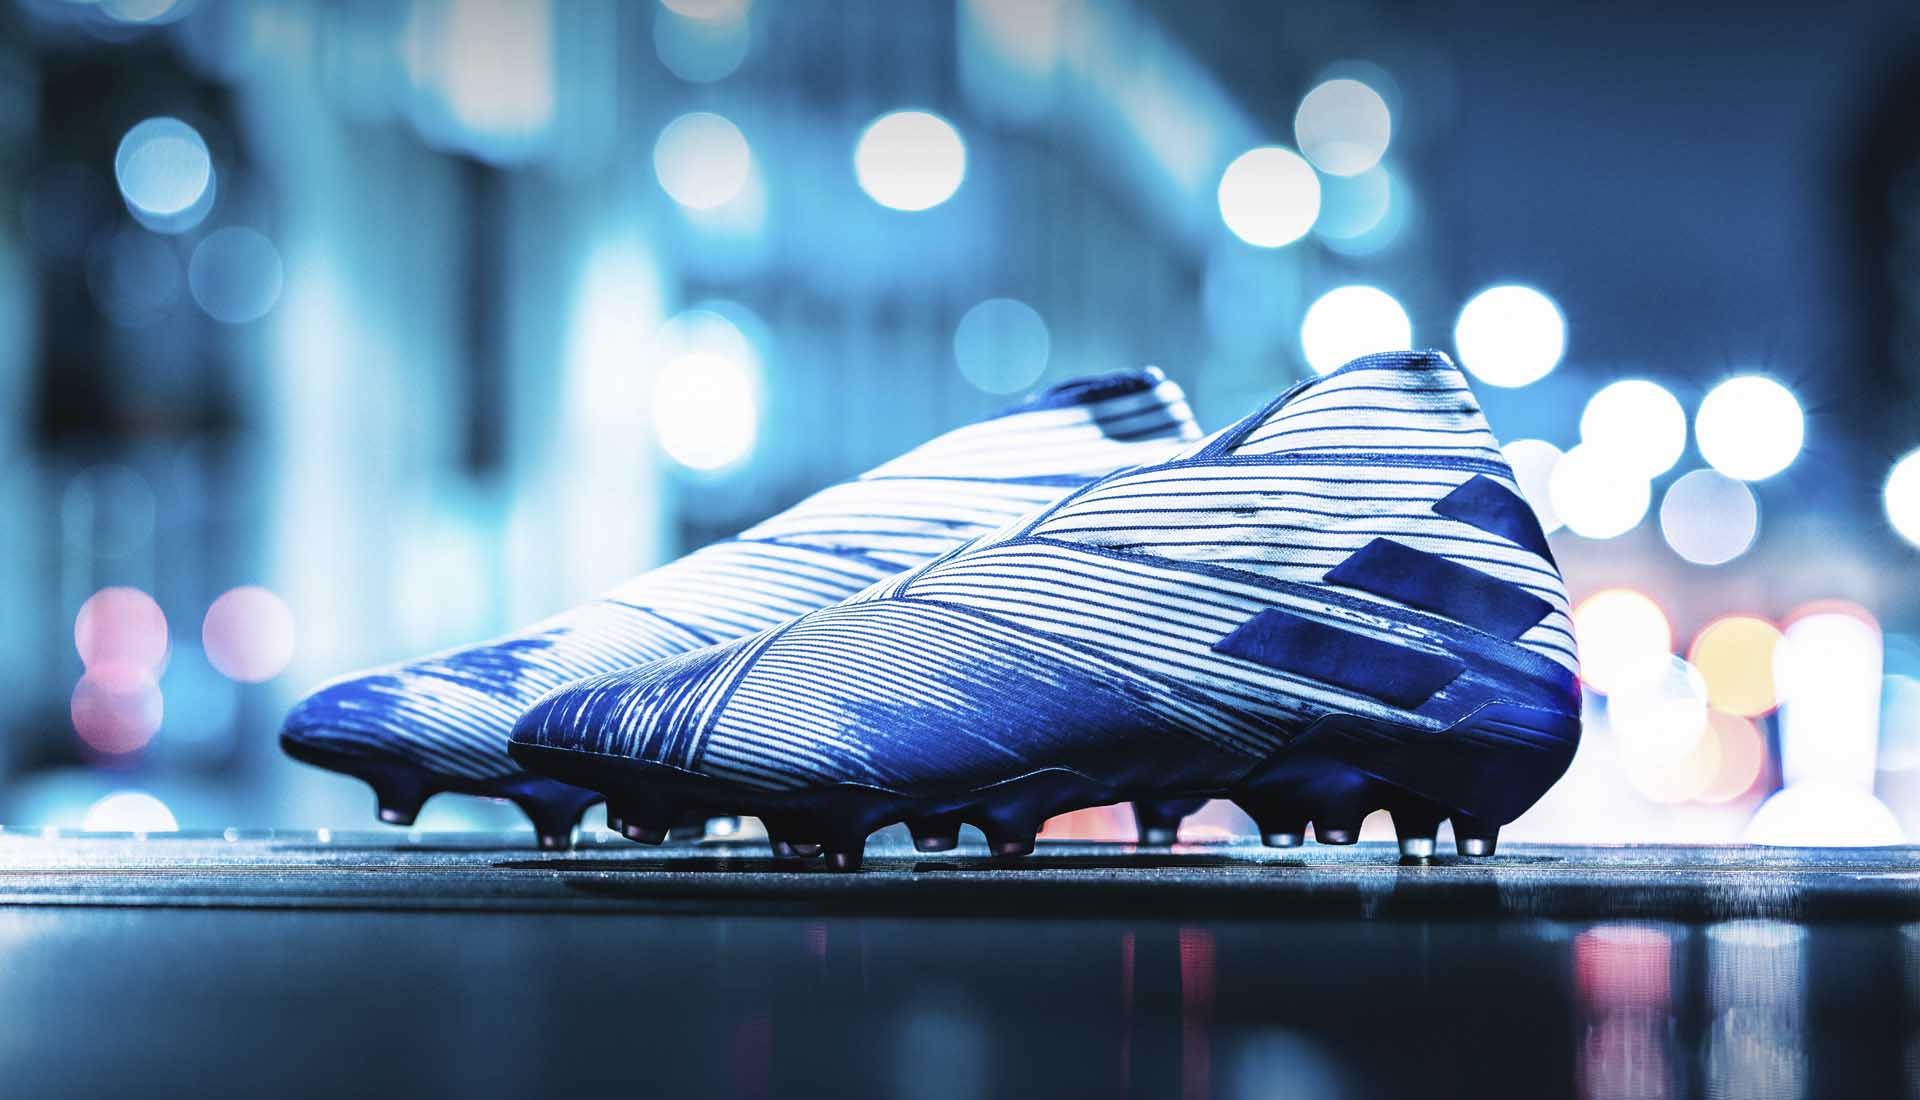 Giày đá banh Adidas Nemeziz 19+ Mutator 5